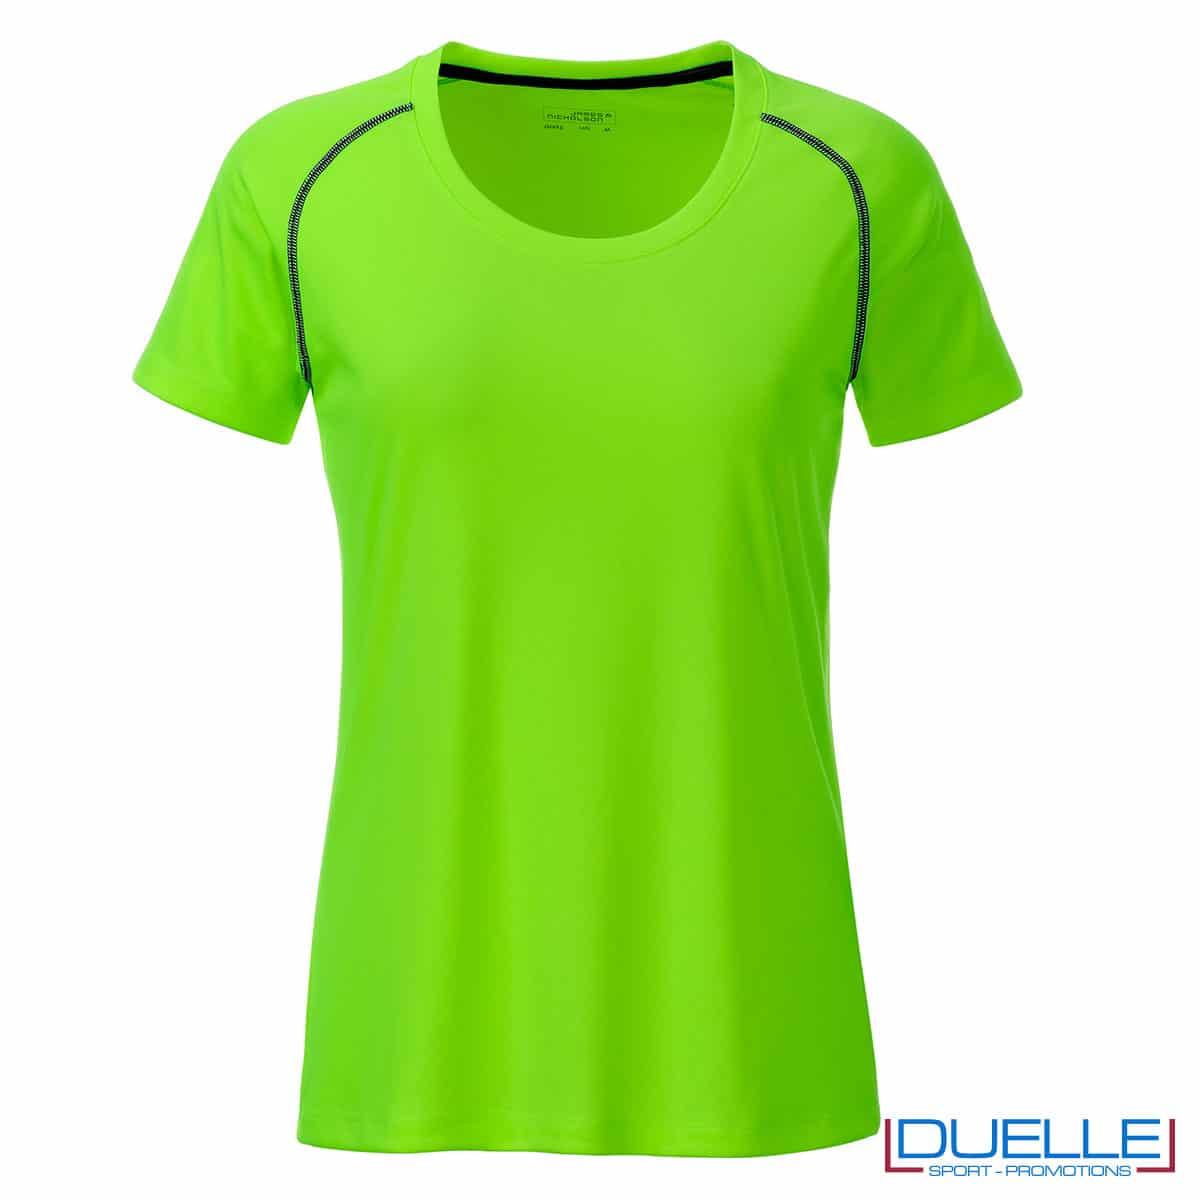 maglia verde fluo sport femminile